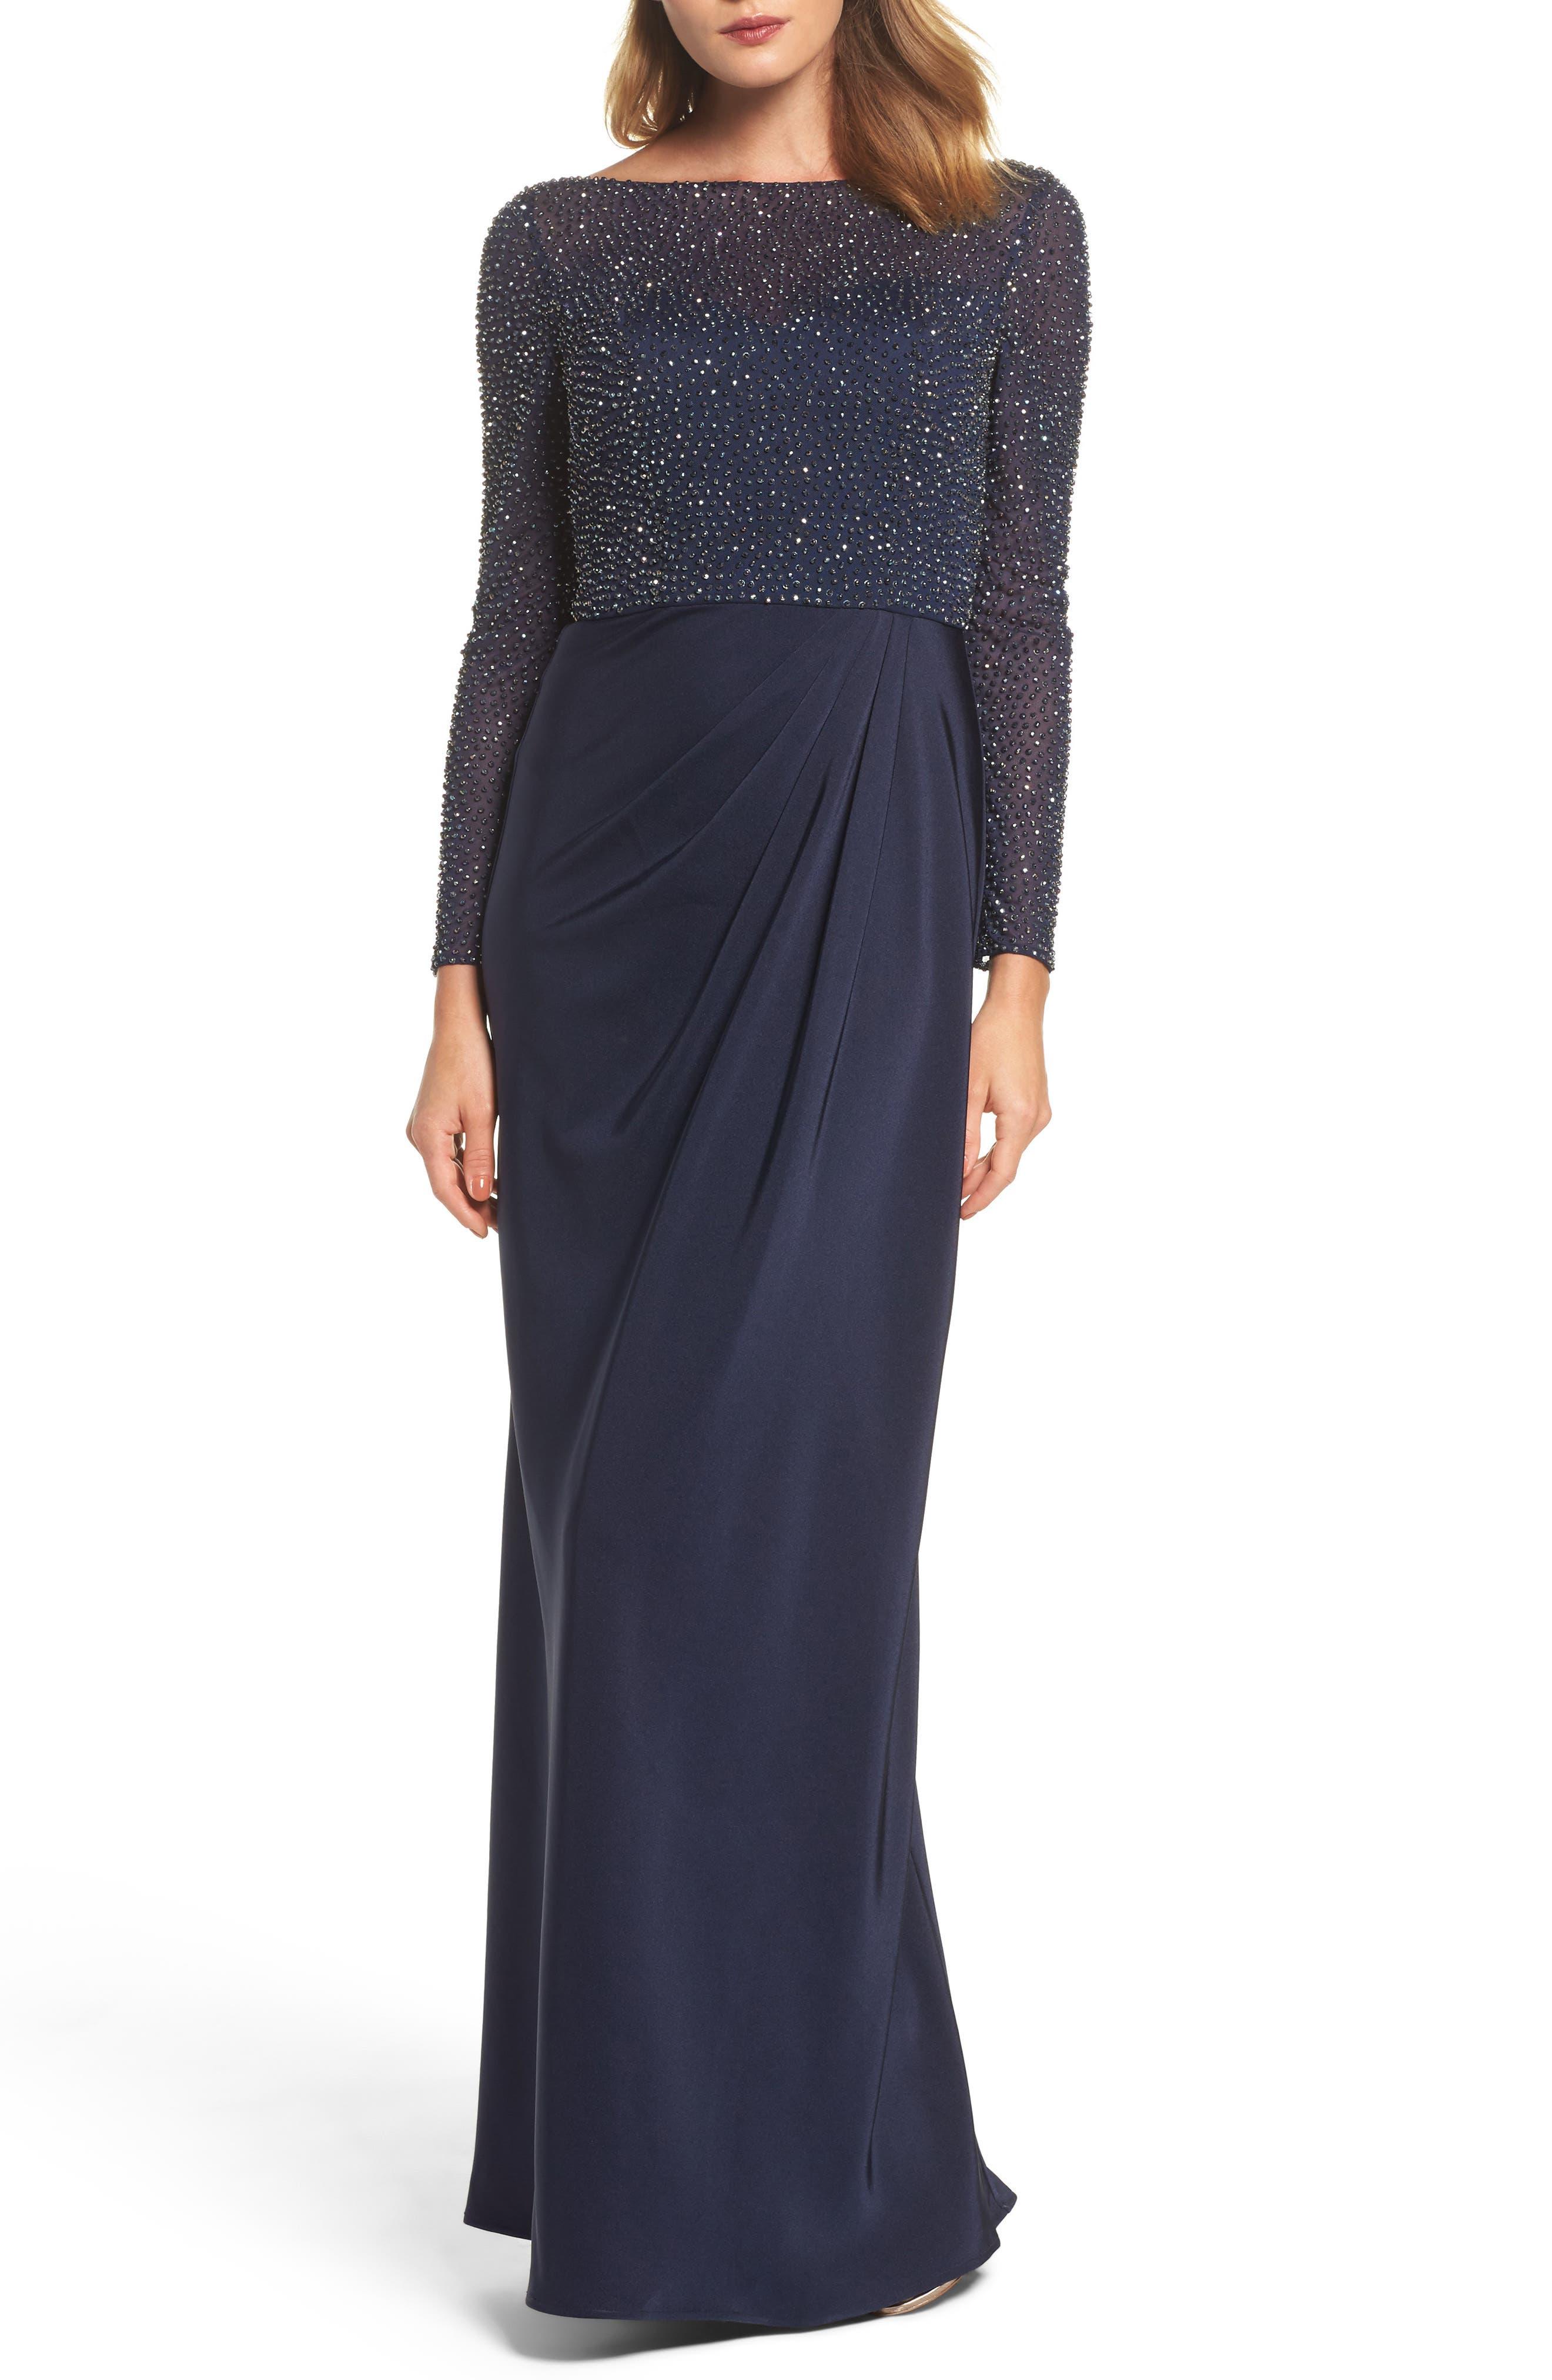 LA FEMME Bead Embellished Gown, Main, color, NAVY